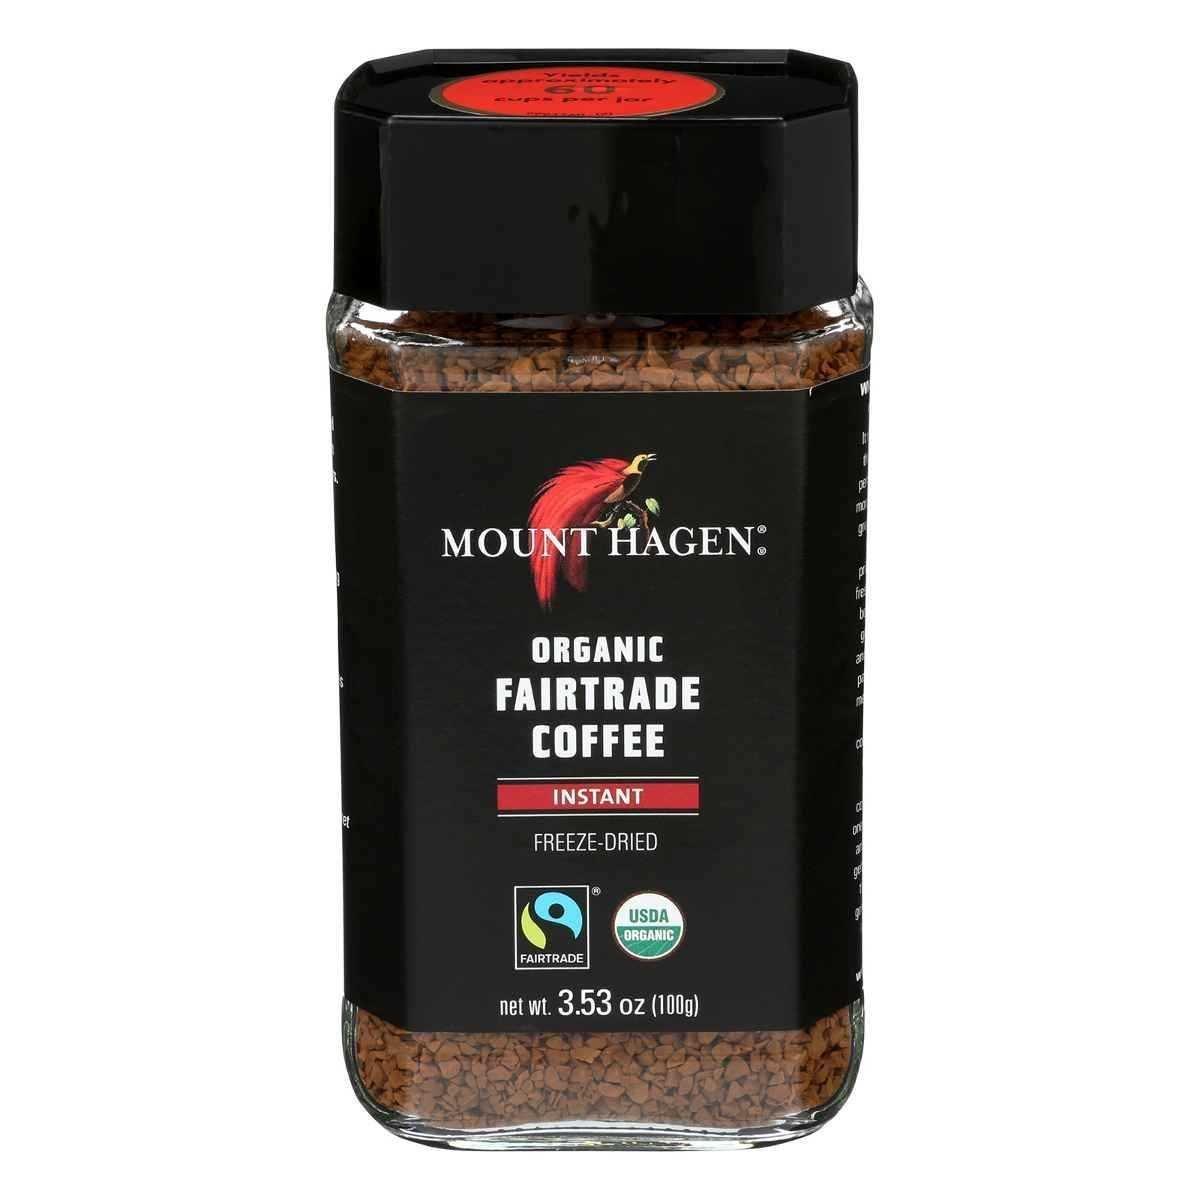 B000ESJR20 Mount Hagen Organic Freeze Dried Instant Coffee, 3.53-Ounce Jars (Pack of 6) 61pRnTItvOL